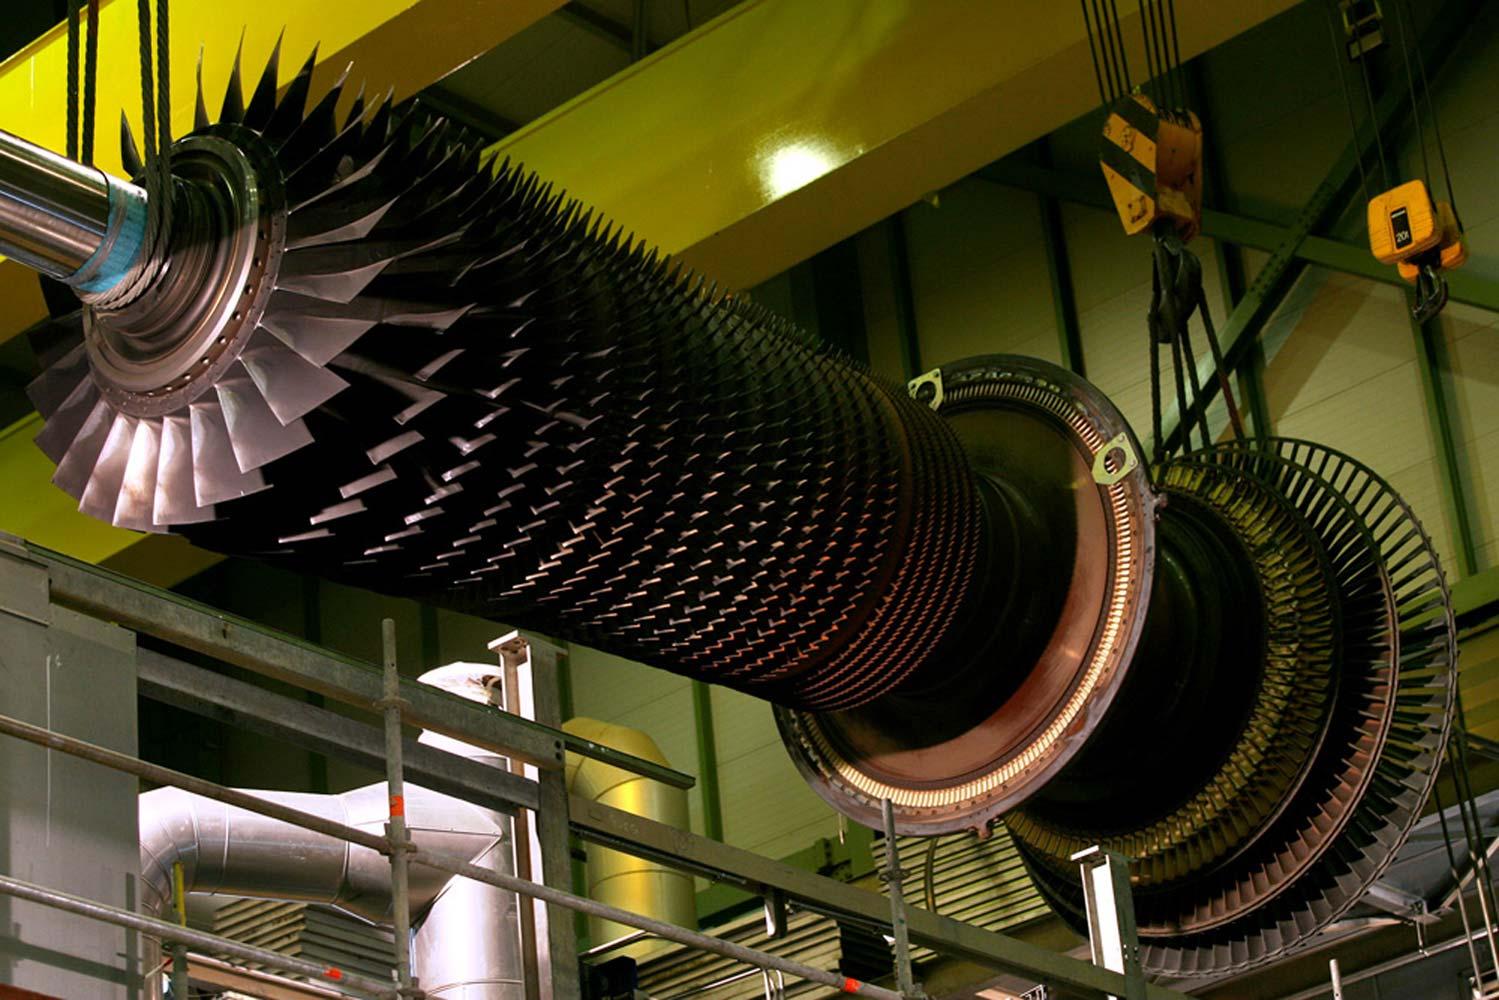 11-industrial-turbina-cicle-combinat-alstom-002